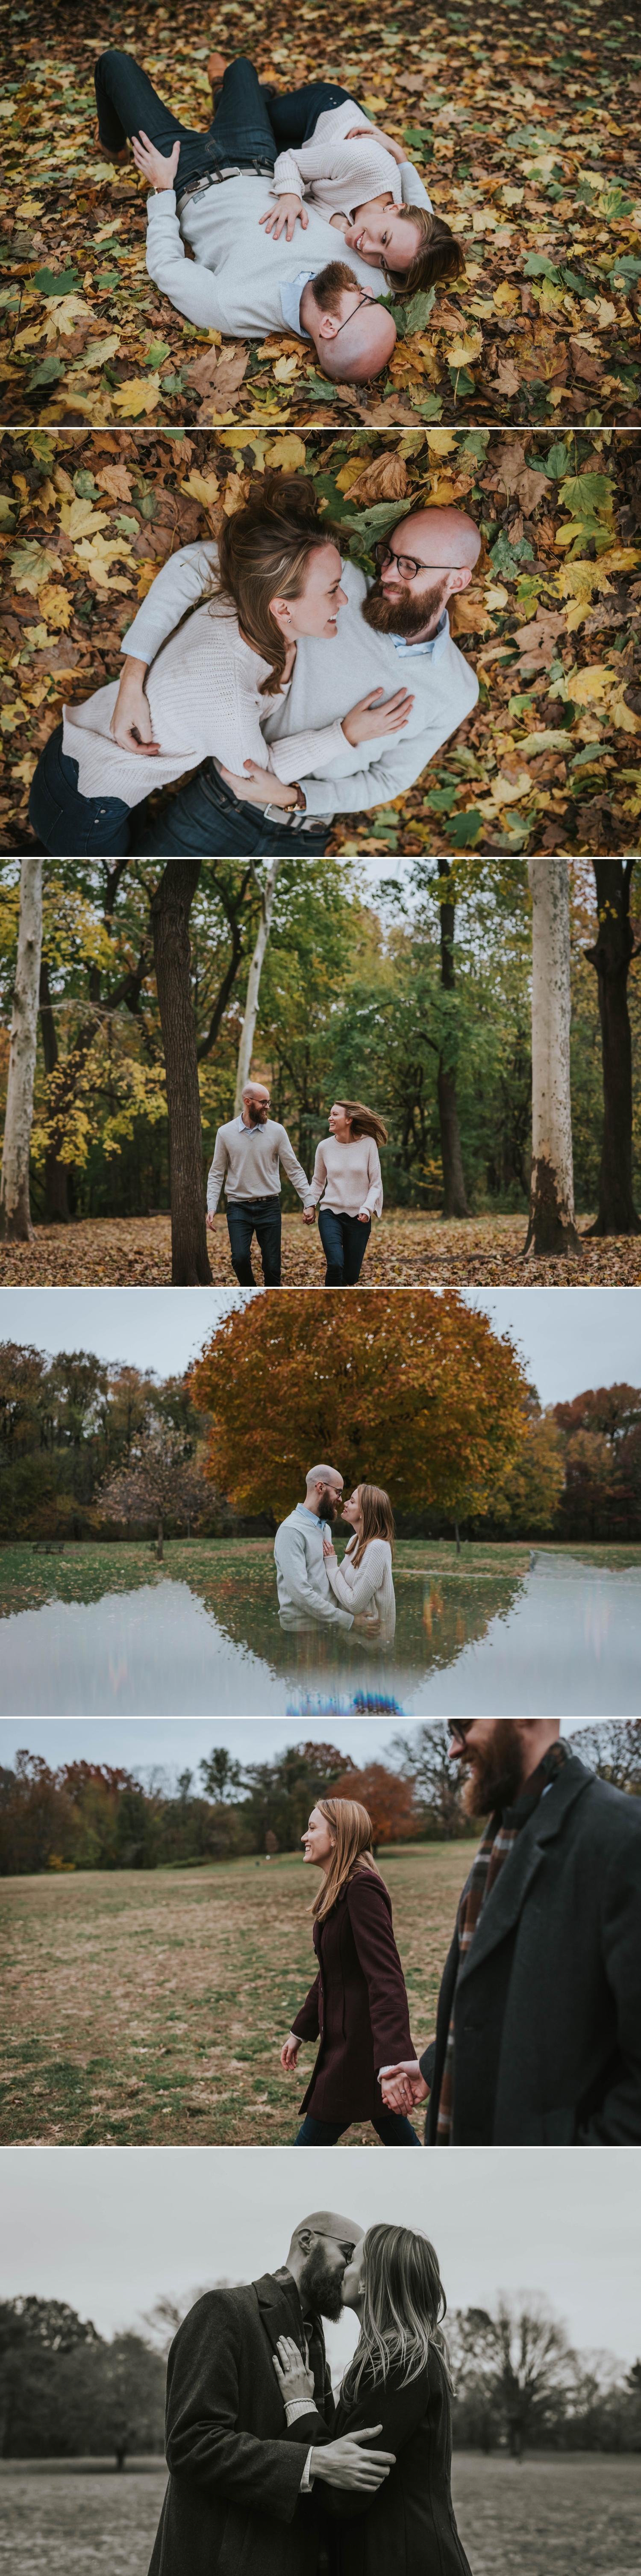 Brad & Lindsay Prospect Park Engagement Brooklyn NYC (4).jpg